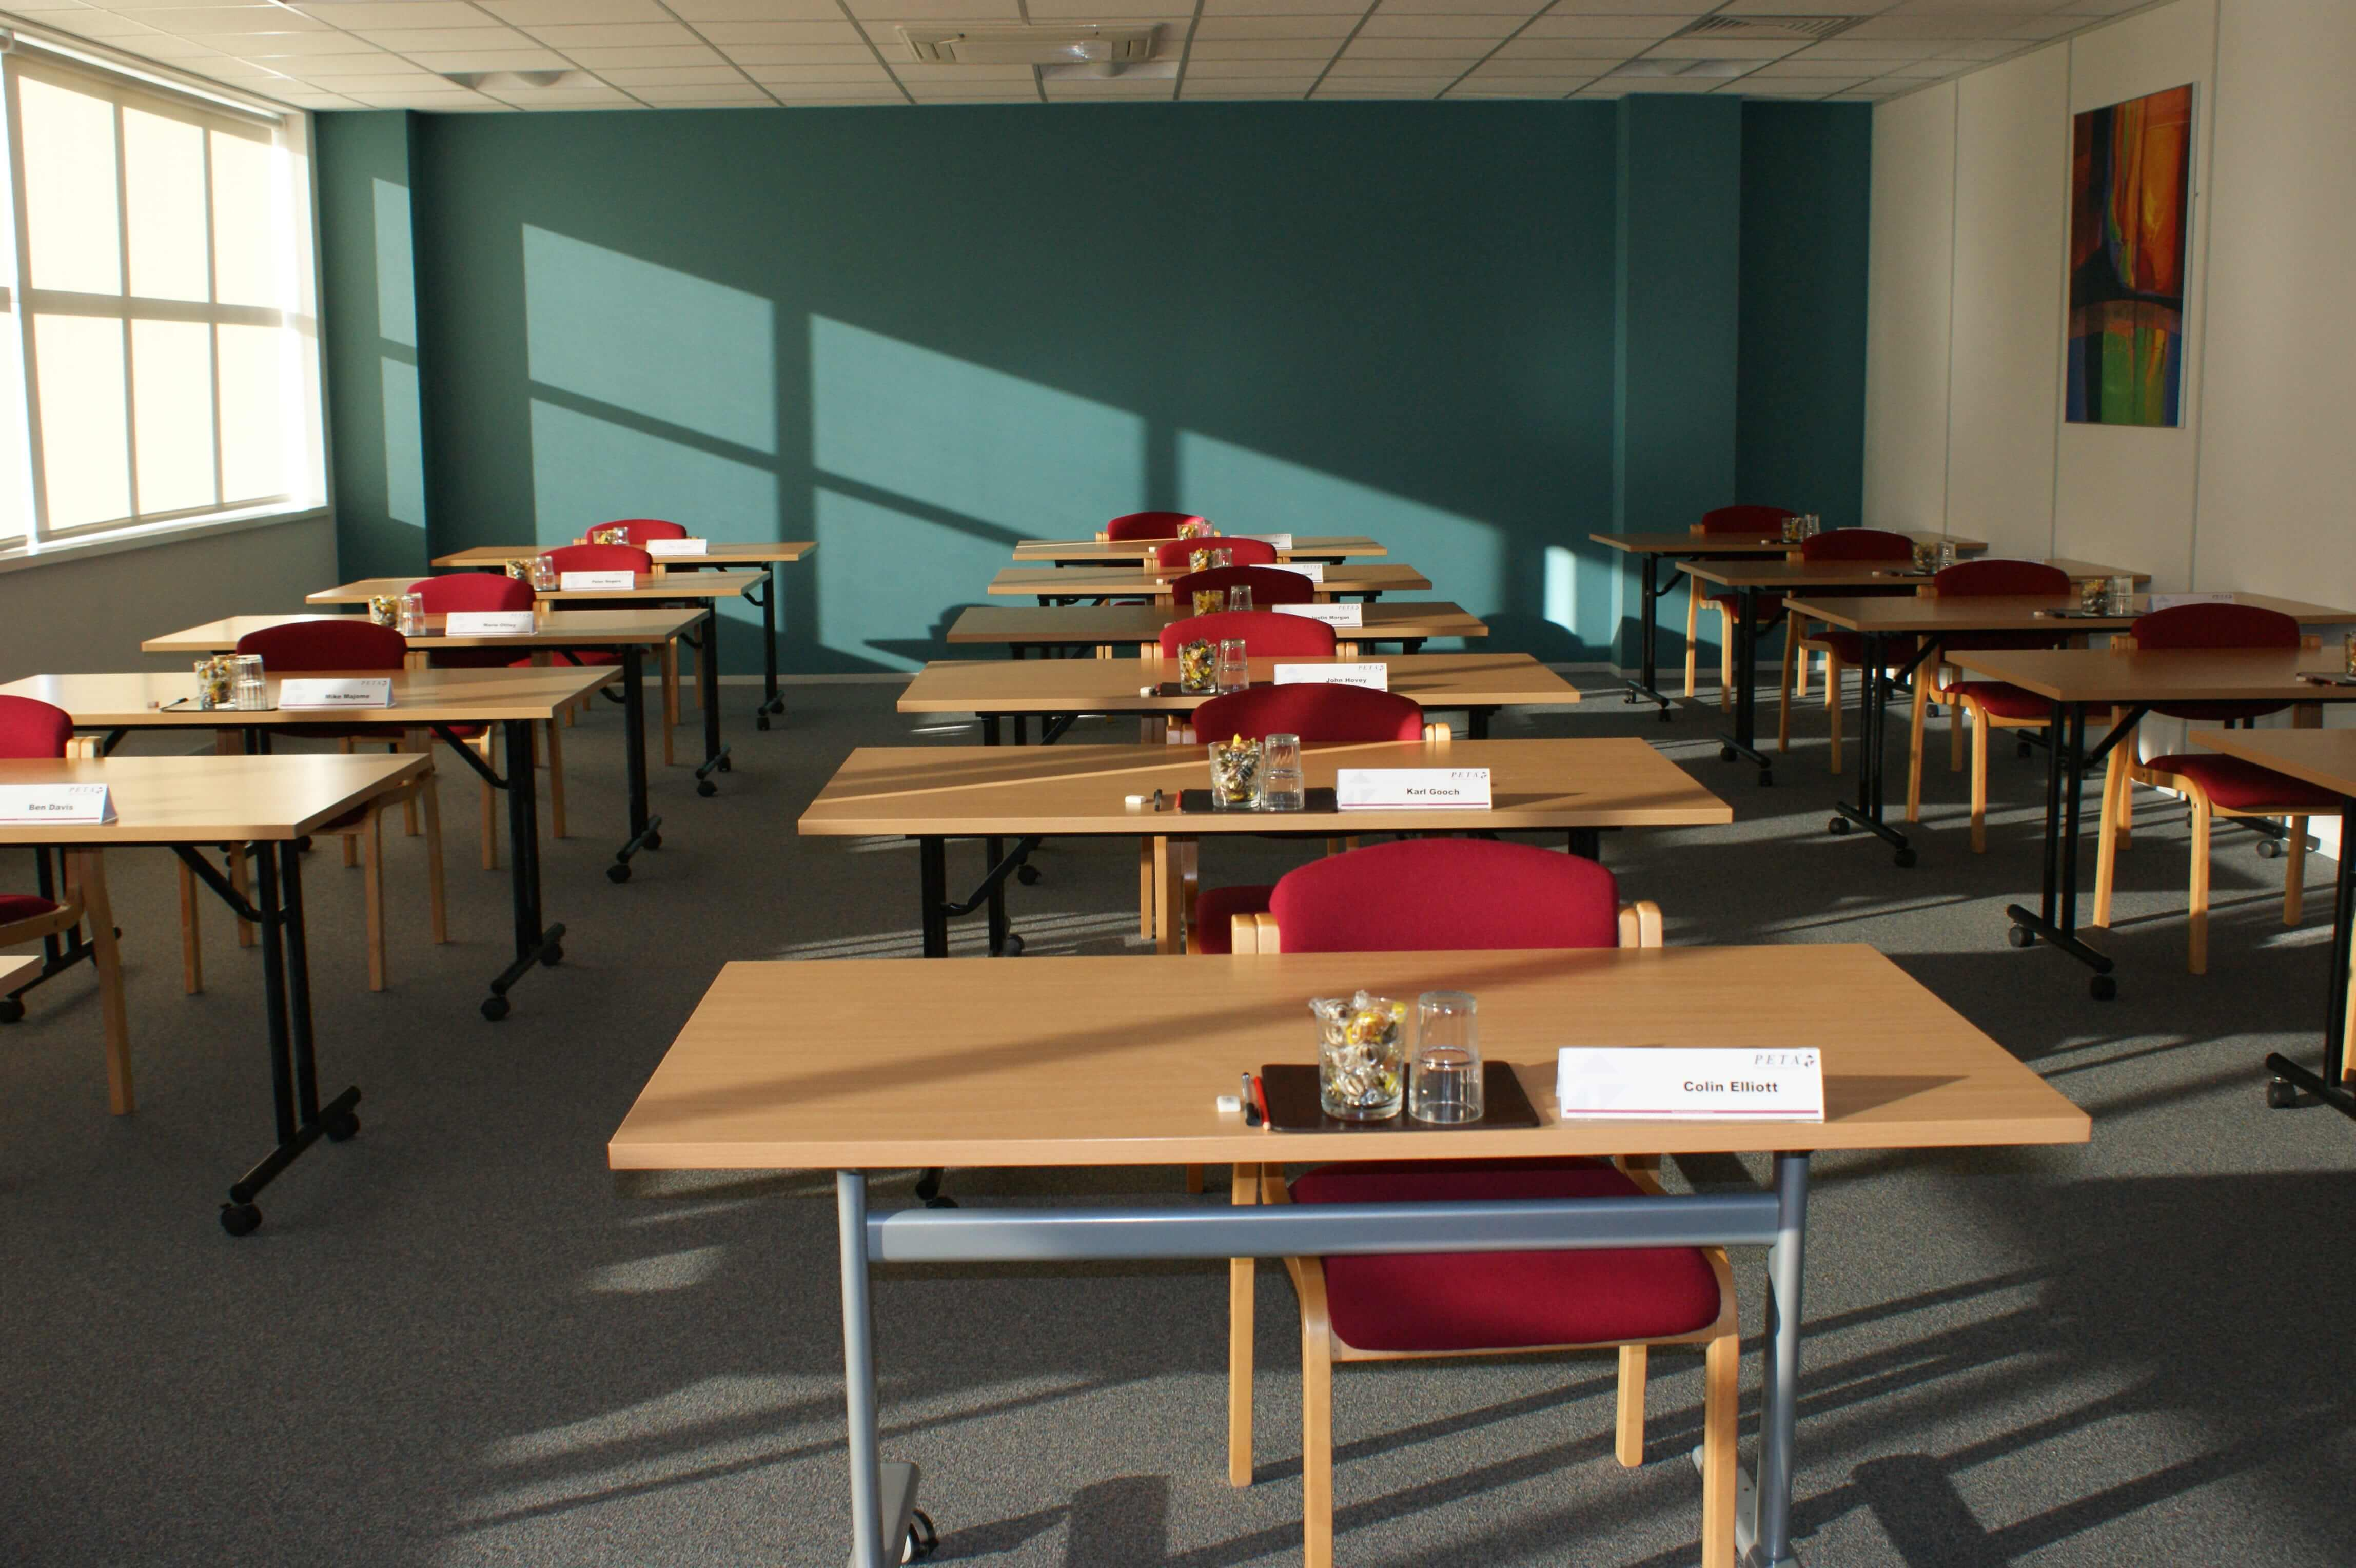 Classroom at PETA with desks